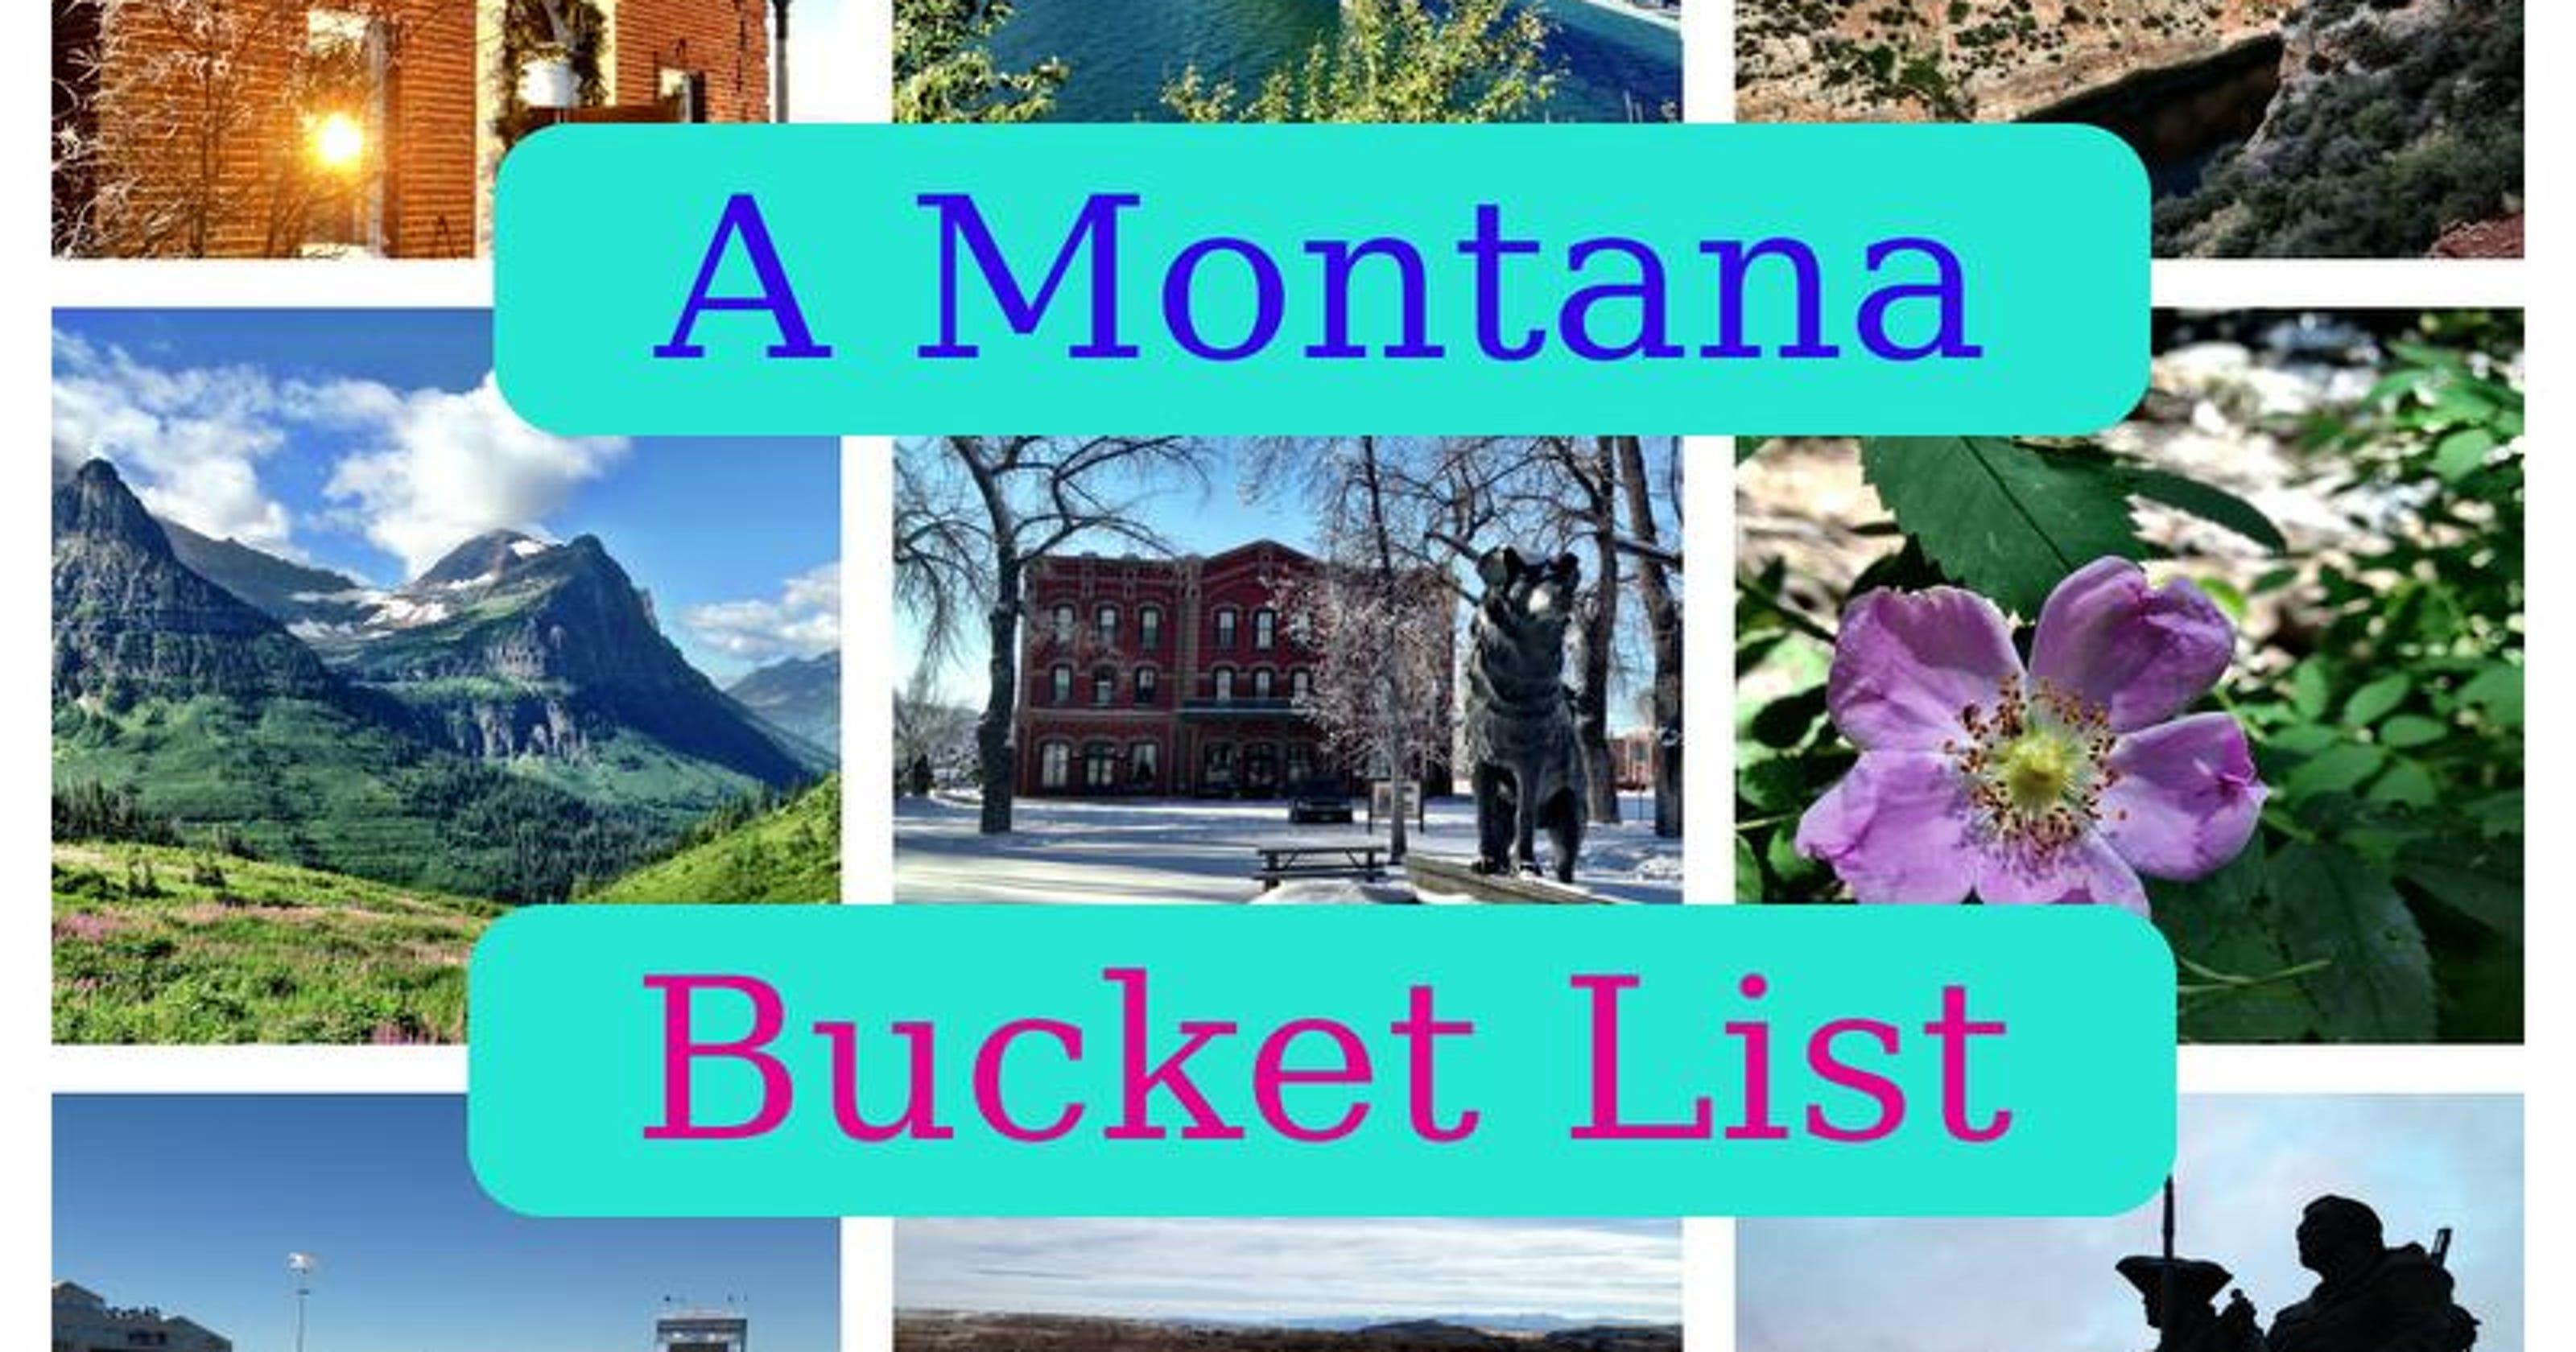 A Montana bucket list: 100 things every Montanan should do